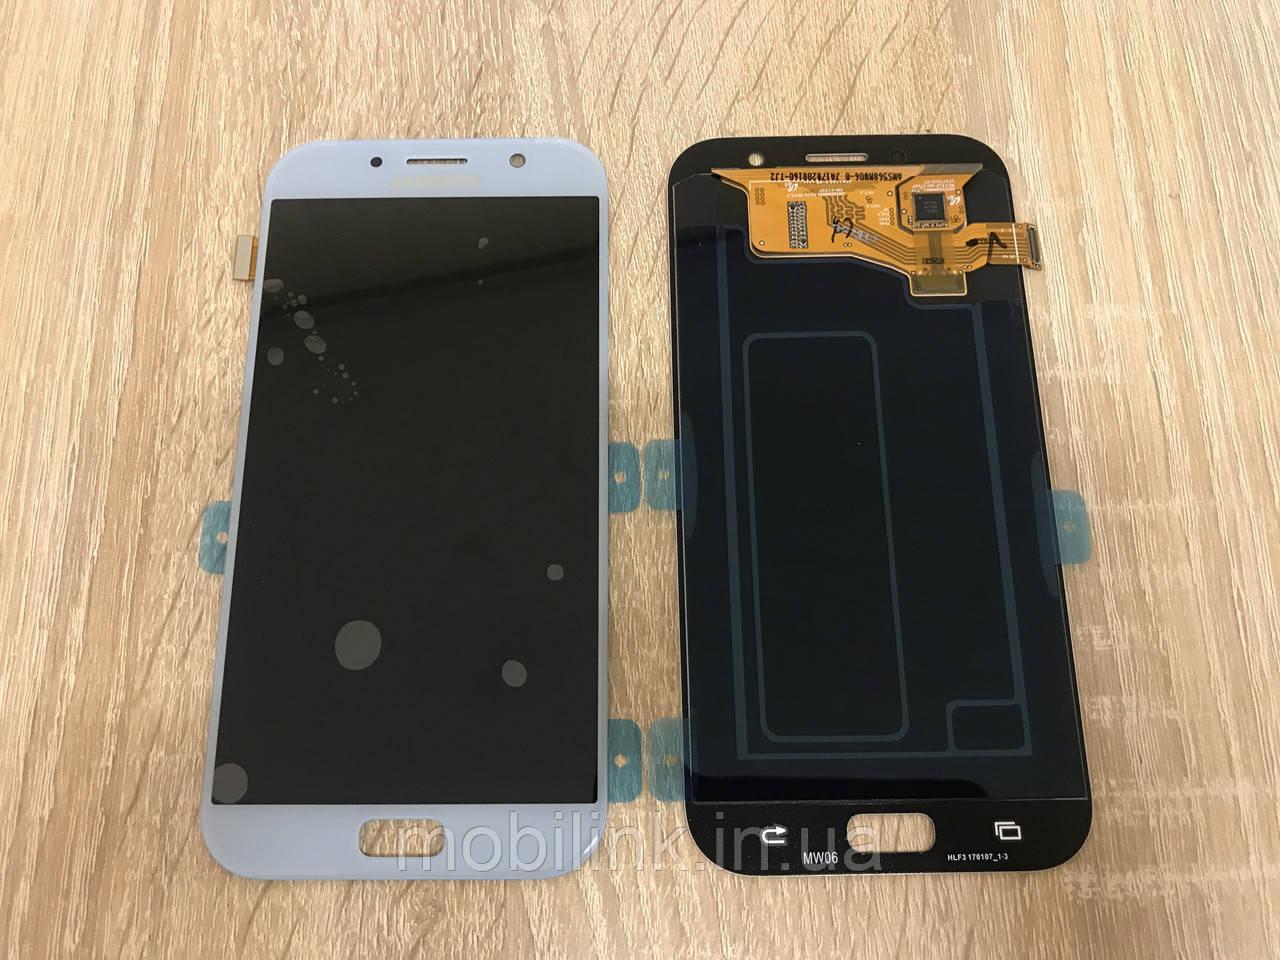 Дисплей на Samsung A720 Galaxy A7(2017) Голубой(Blue),GH97-19723C, Super AMOLED!